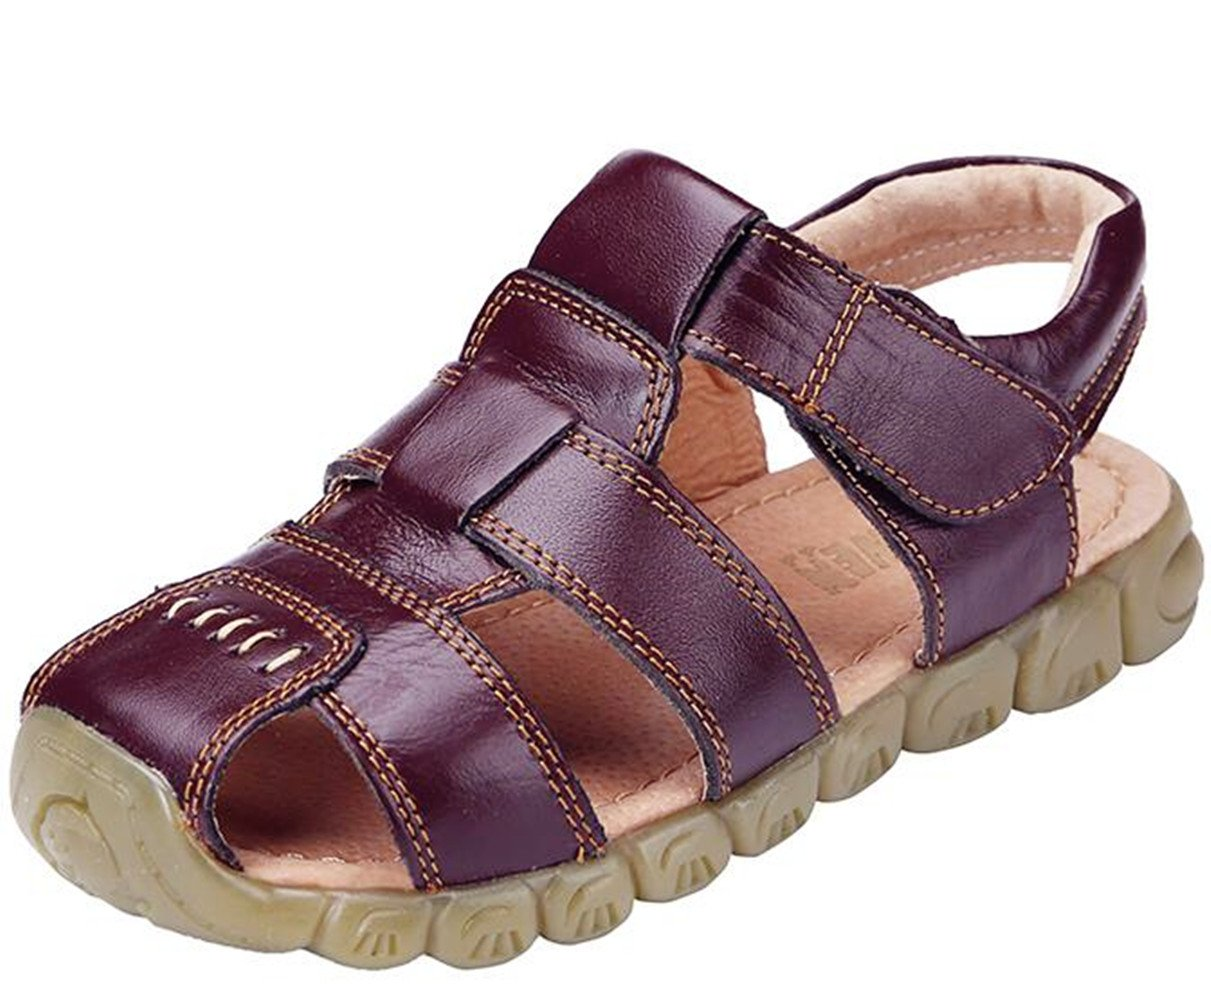 DADAWEN Boy's Girl's Leather Closed Toe Outdoor Sport Sandals (Toddler/Little Kid/Big Kid) 70459TL